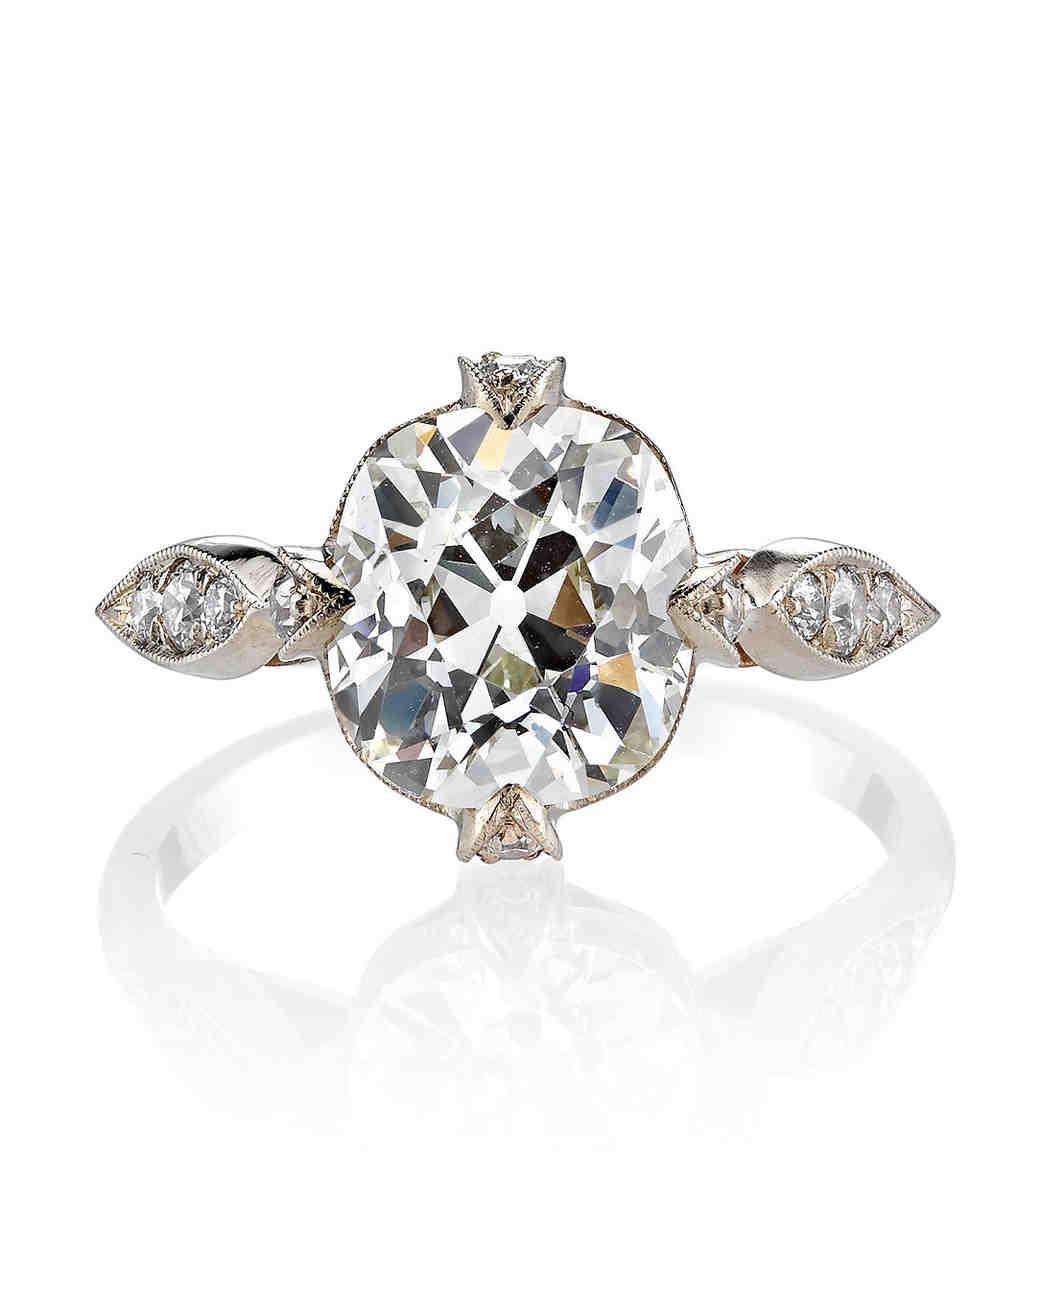 Single Stone Vintage Cushion-Cut Diamond Engagement Ring